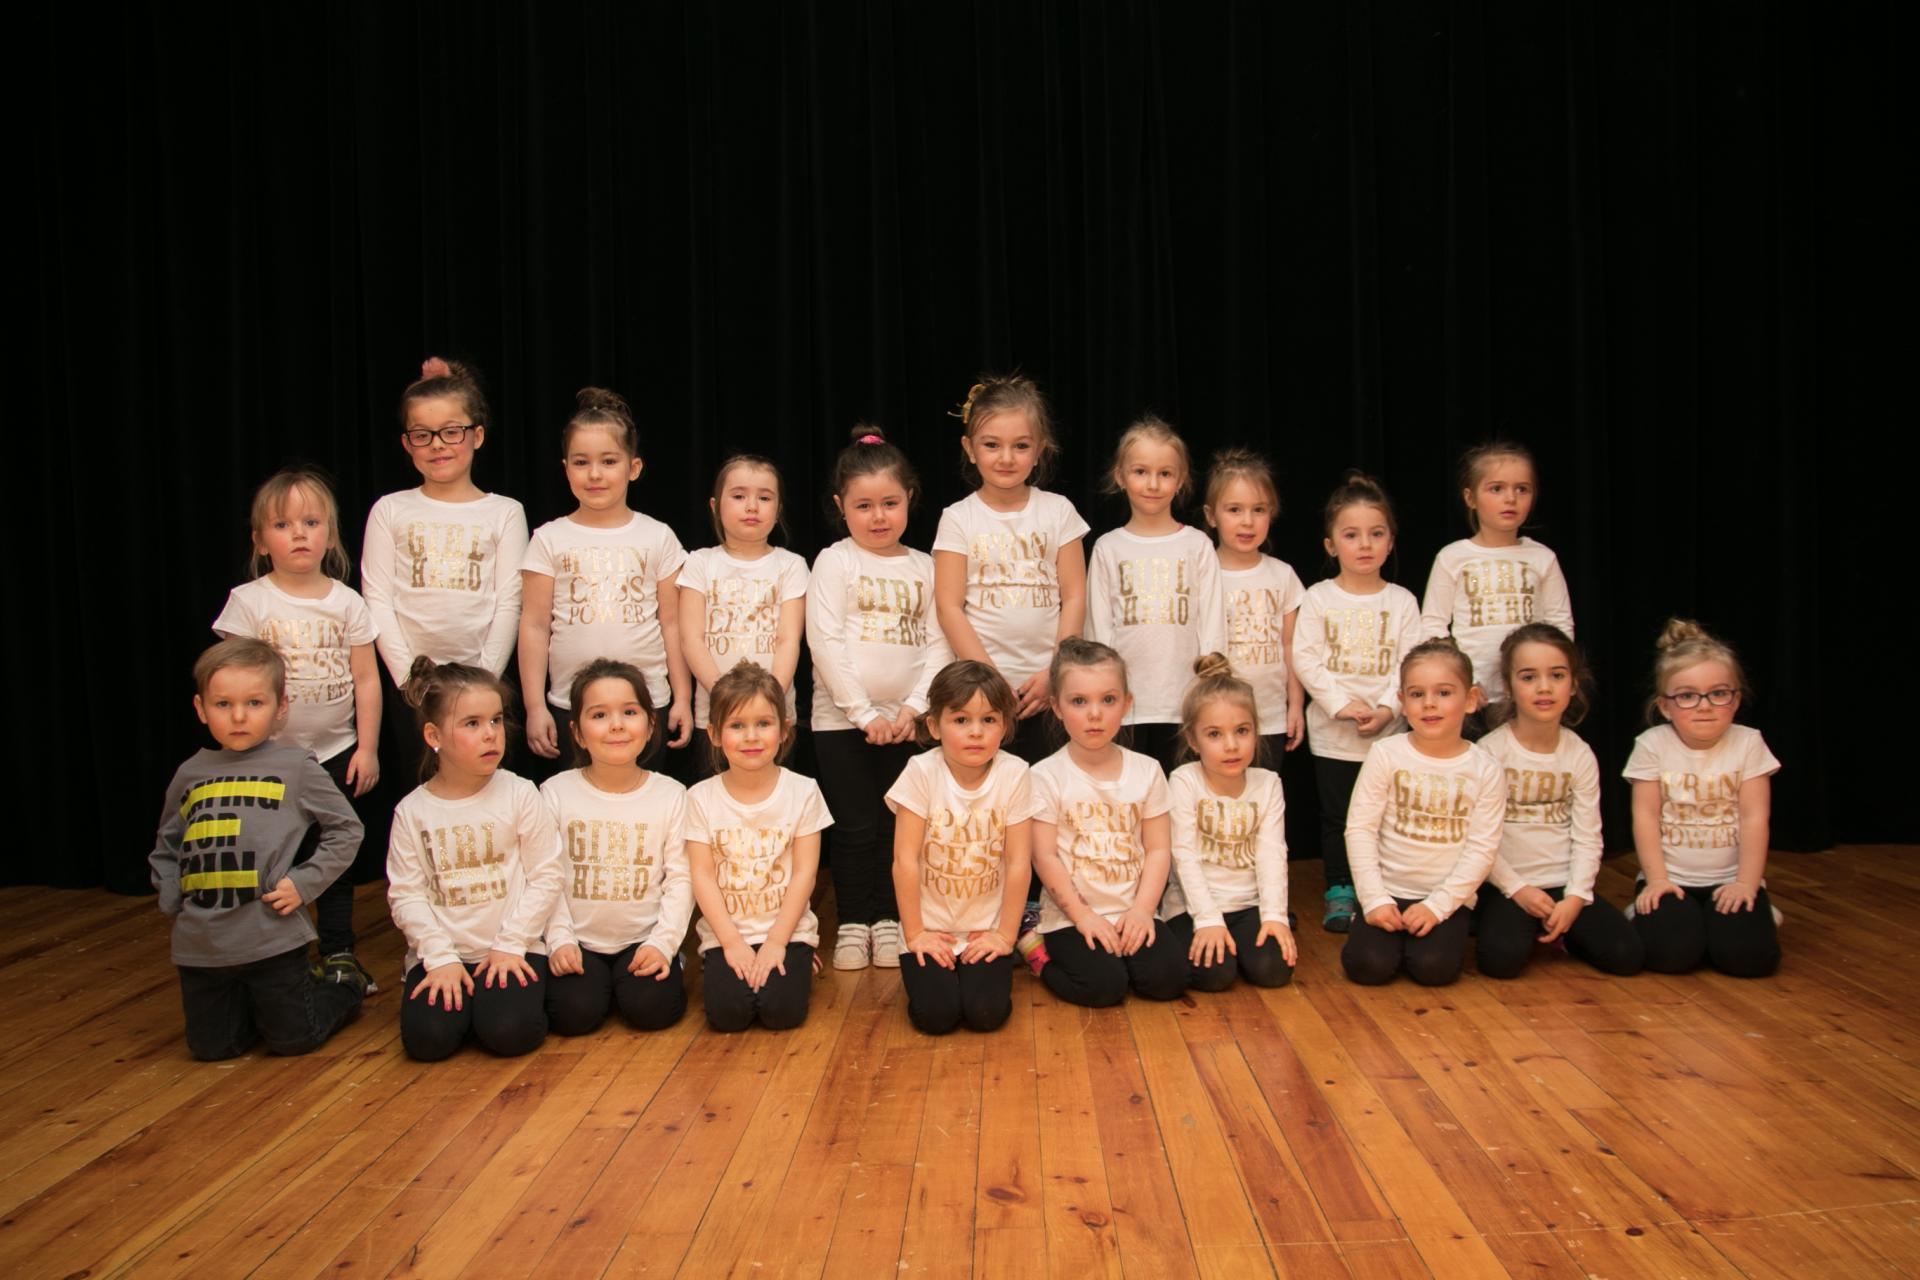 Danse mini groupes 1 et 2 Hiver 2018